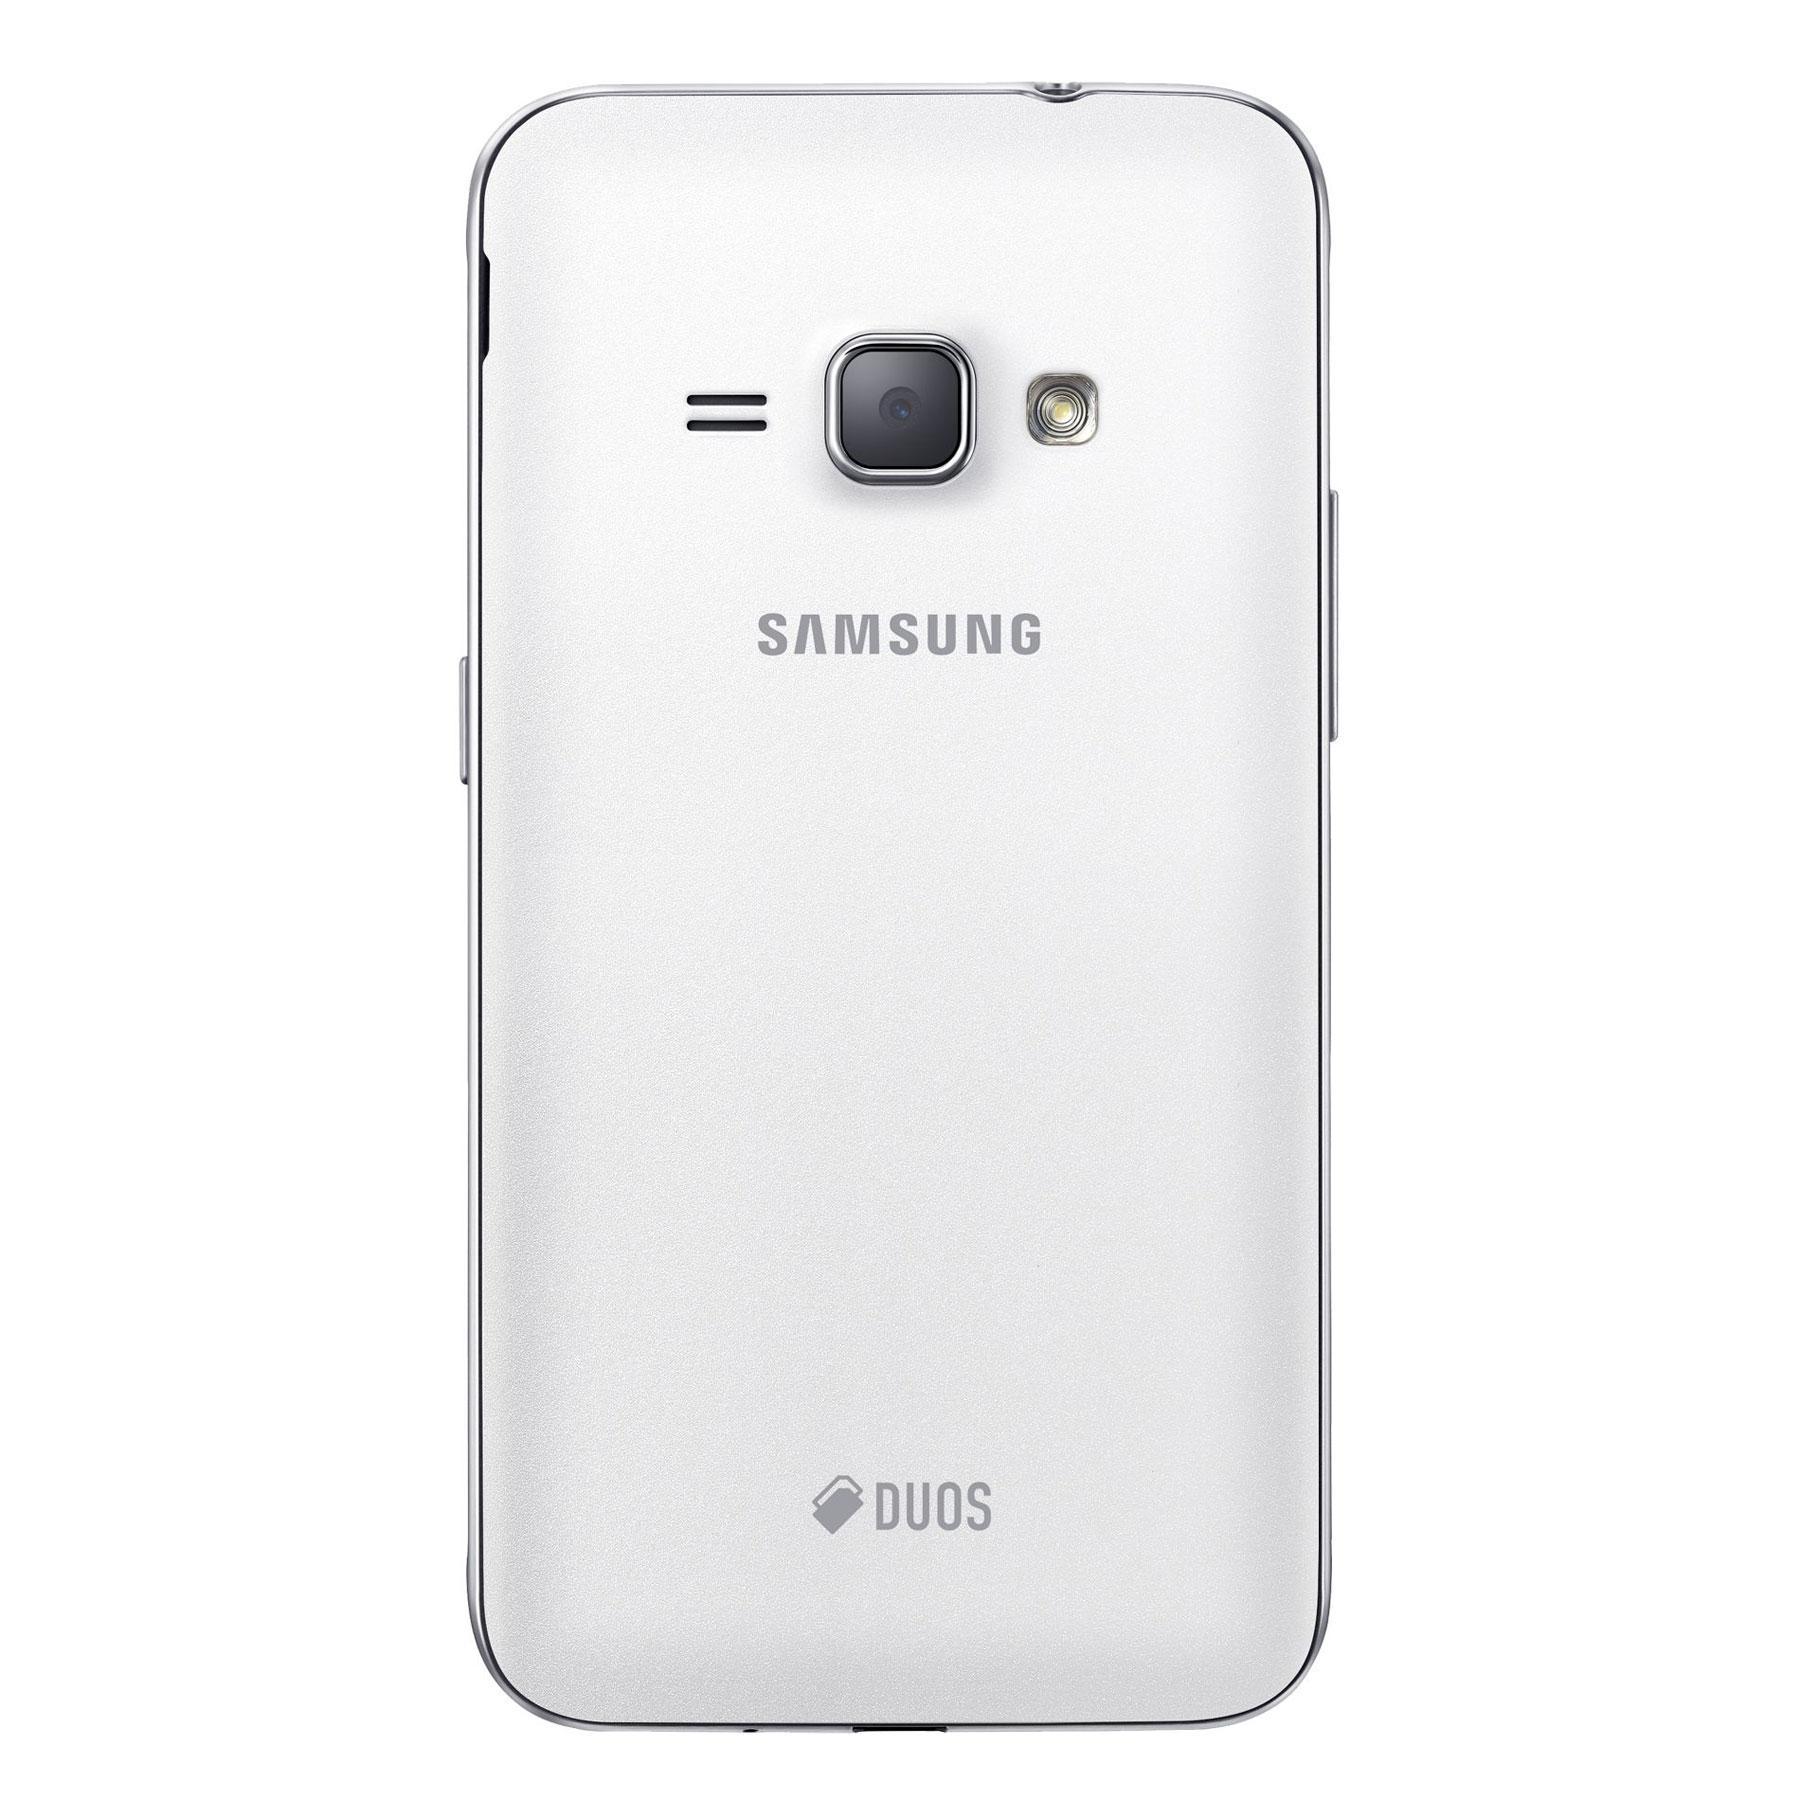 Galaxy J1 (2016) 8 Go - Blanc - Débloqué